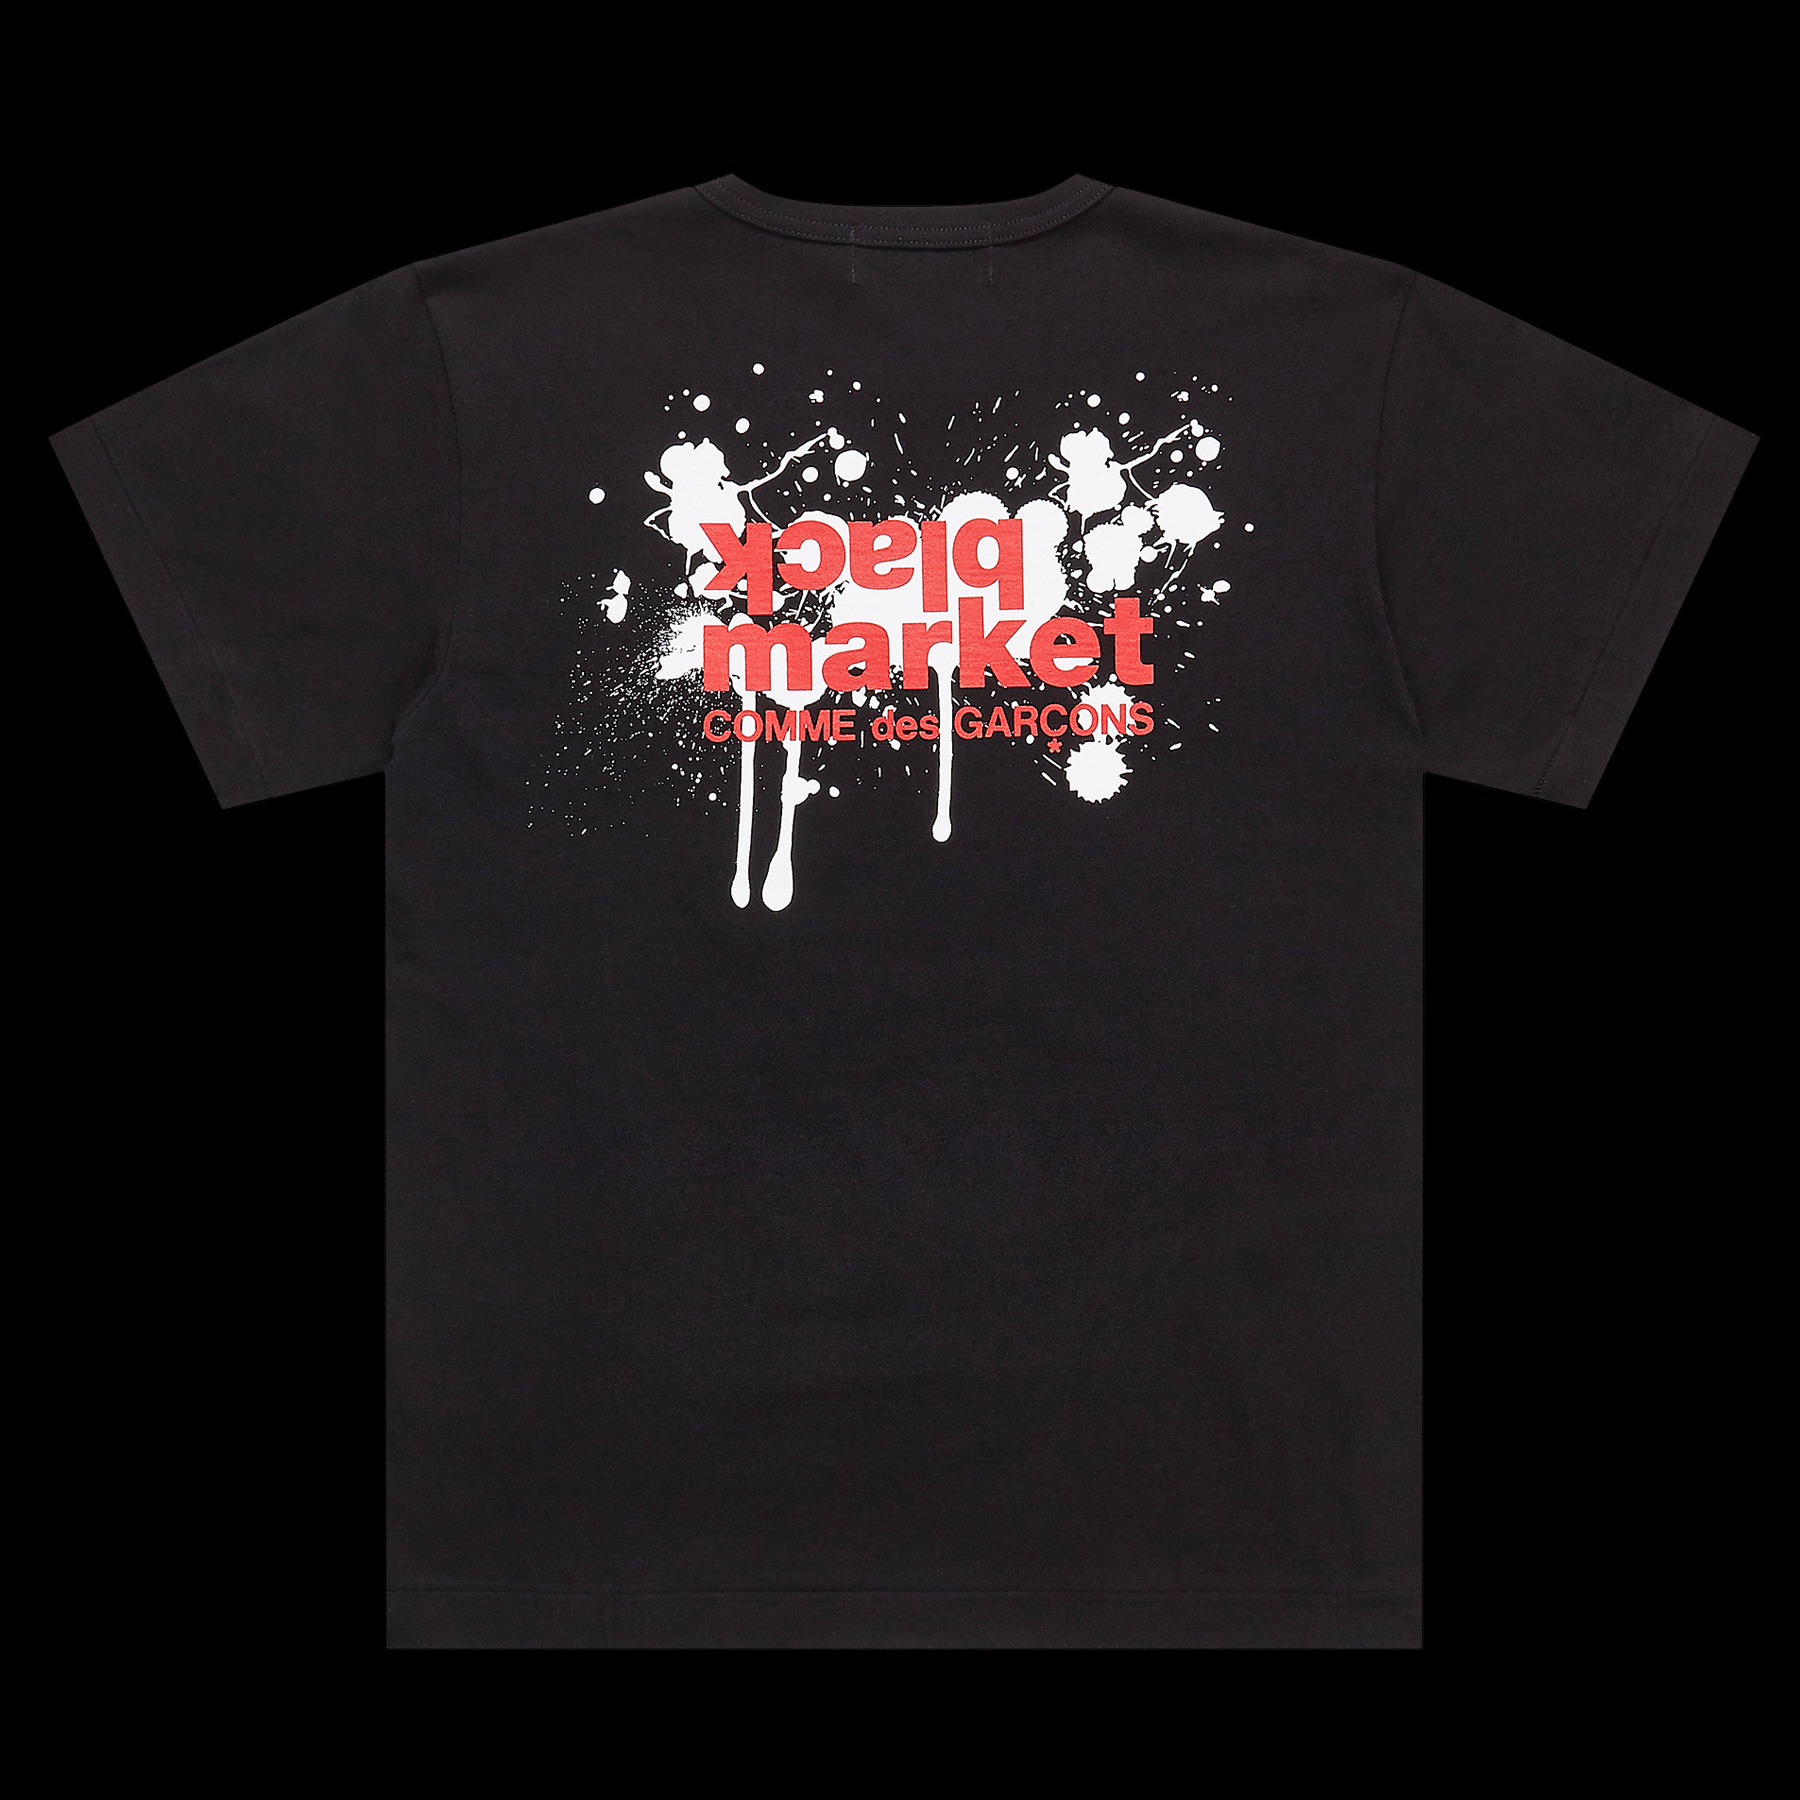 Black_Market_CDG_Character_Print_T-Shirt__OD-T011-051_BLACK_B.jpg